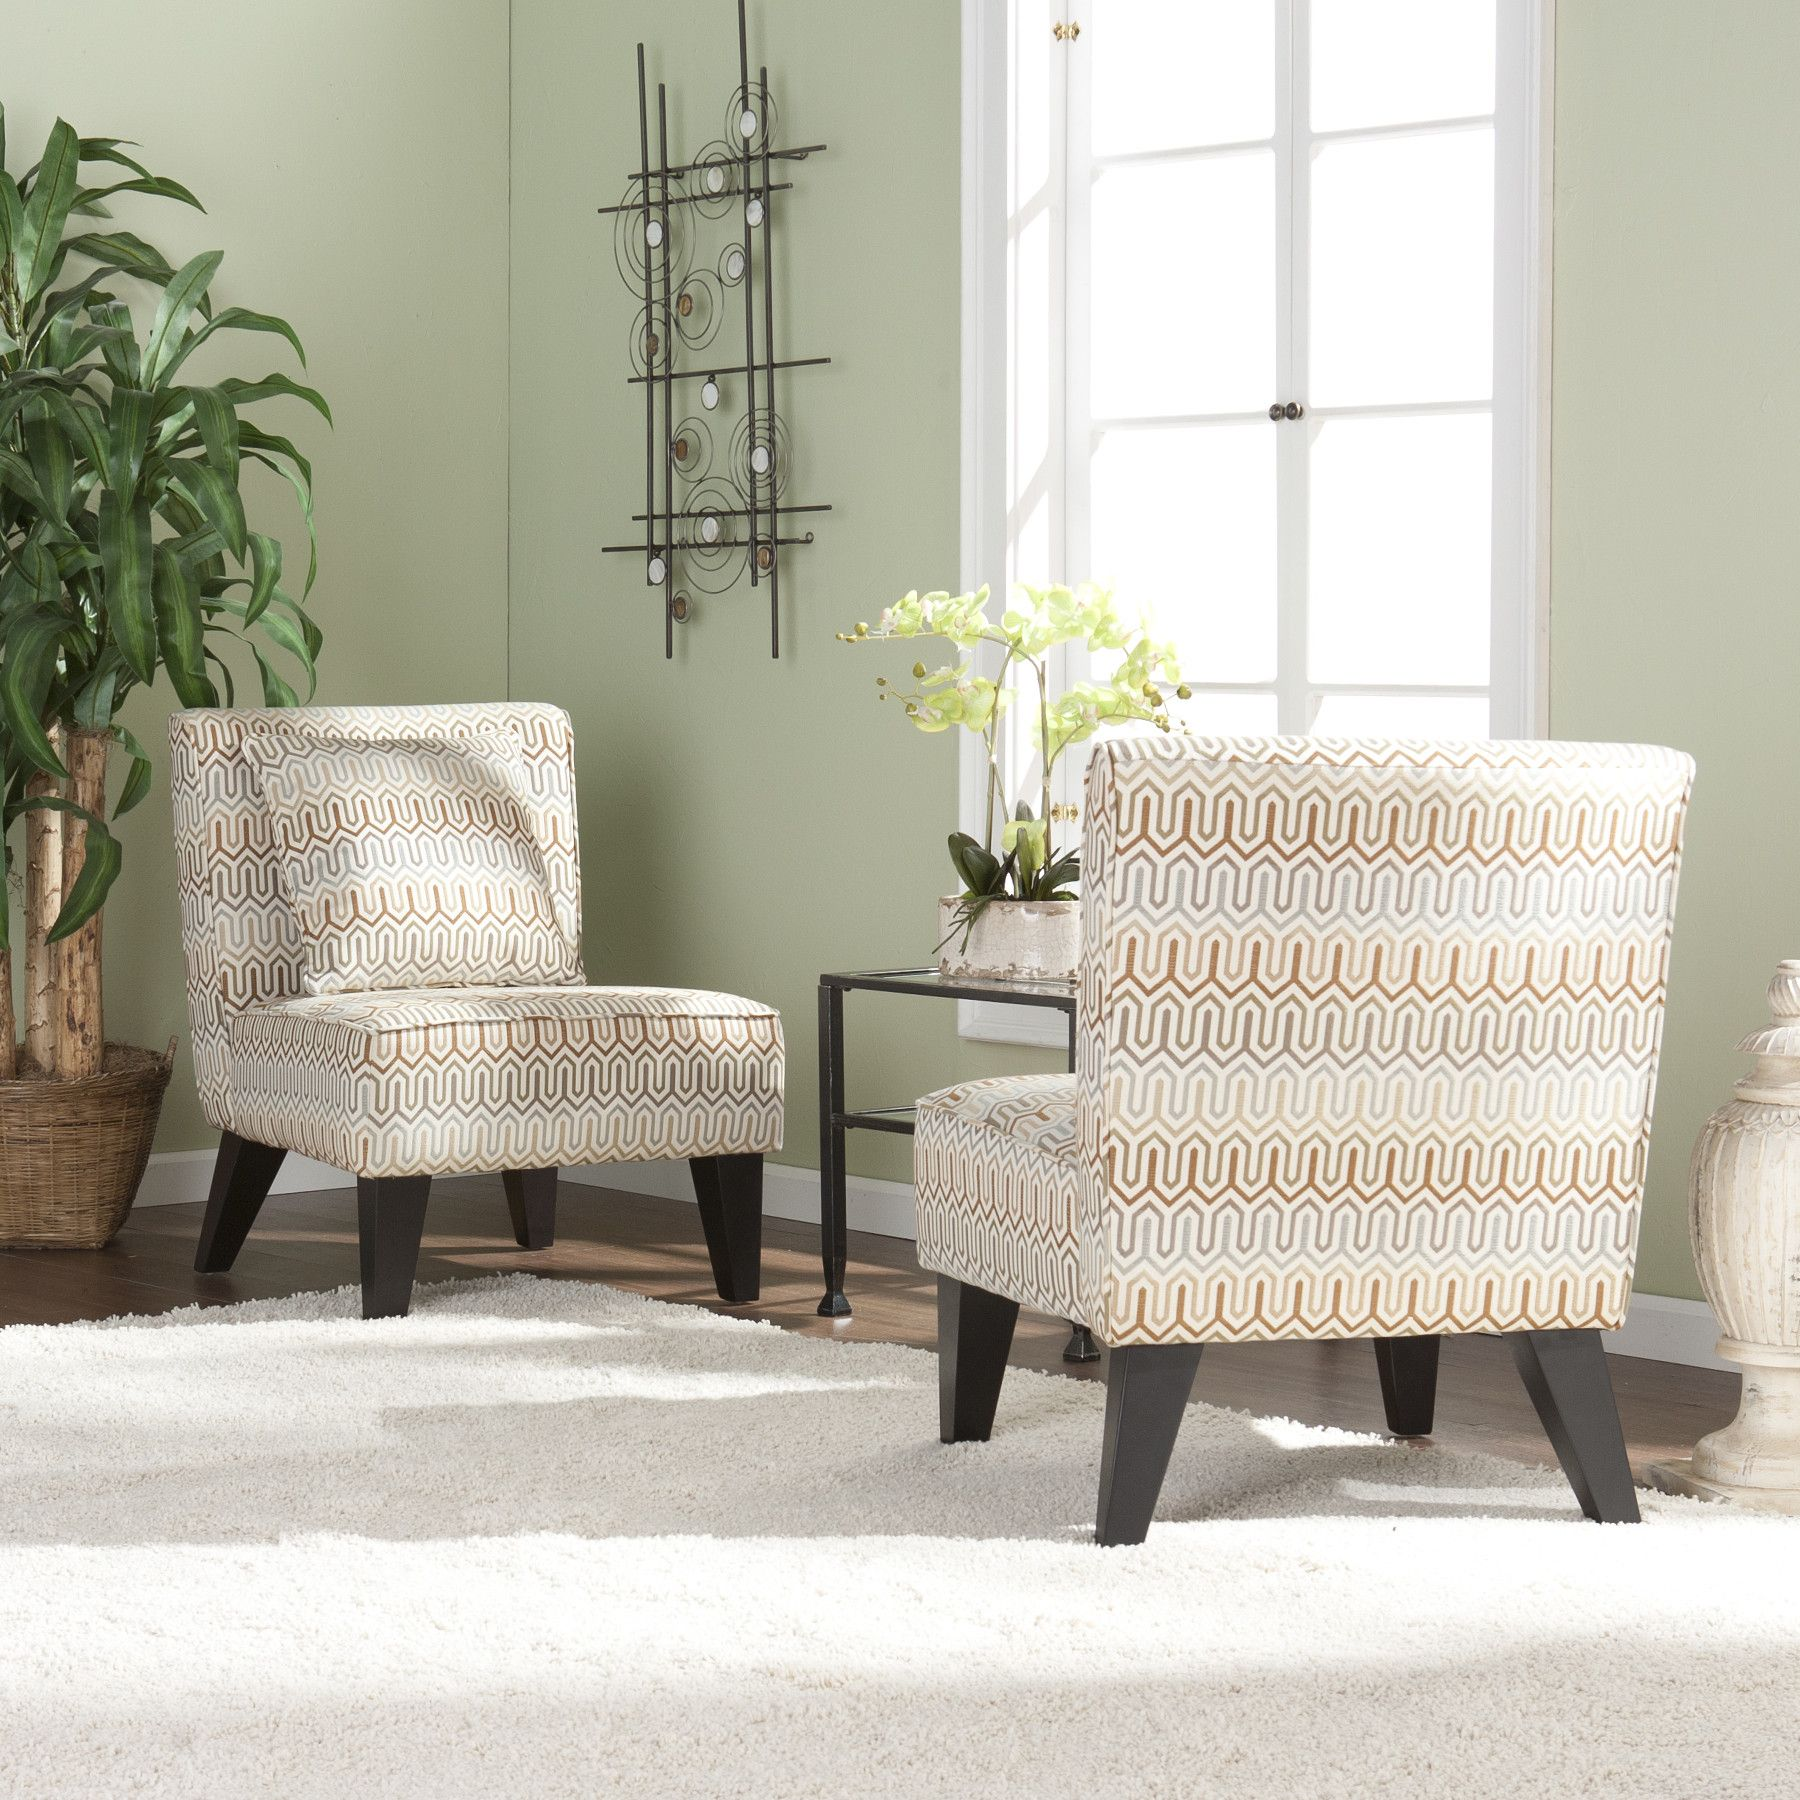 Wildon Home Deva Jade Fabric Slipper Chair Set Of 2 With